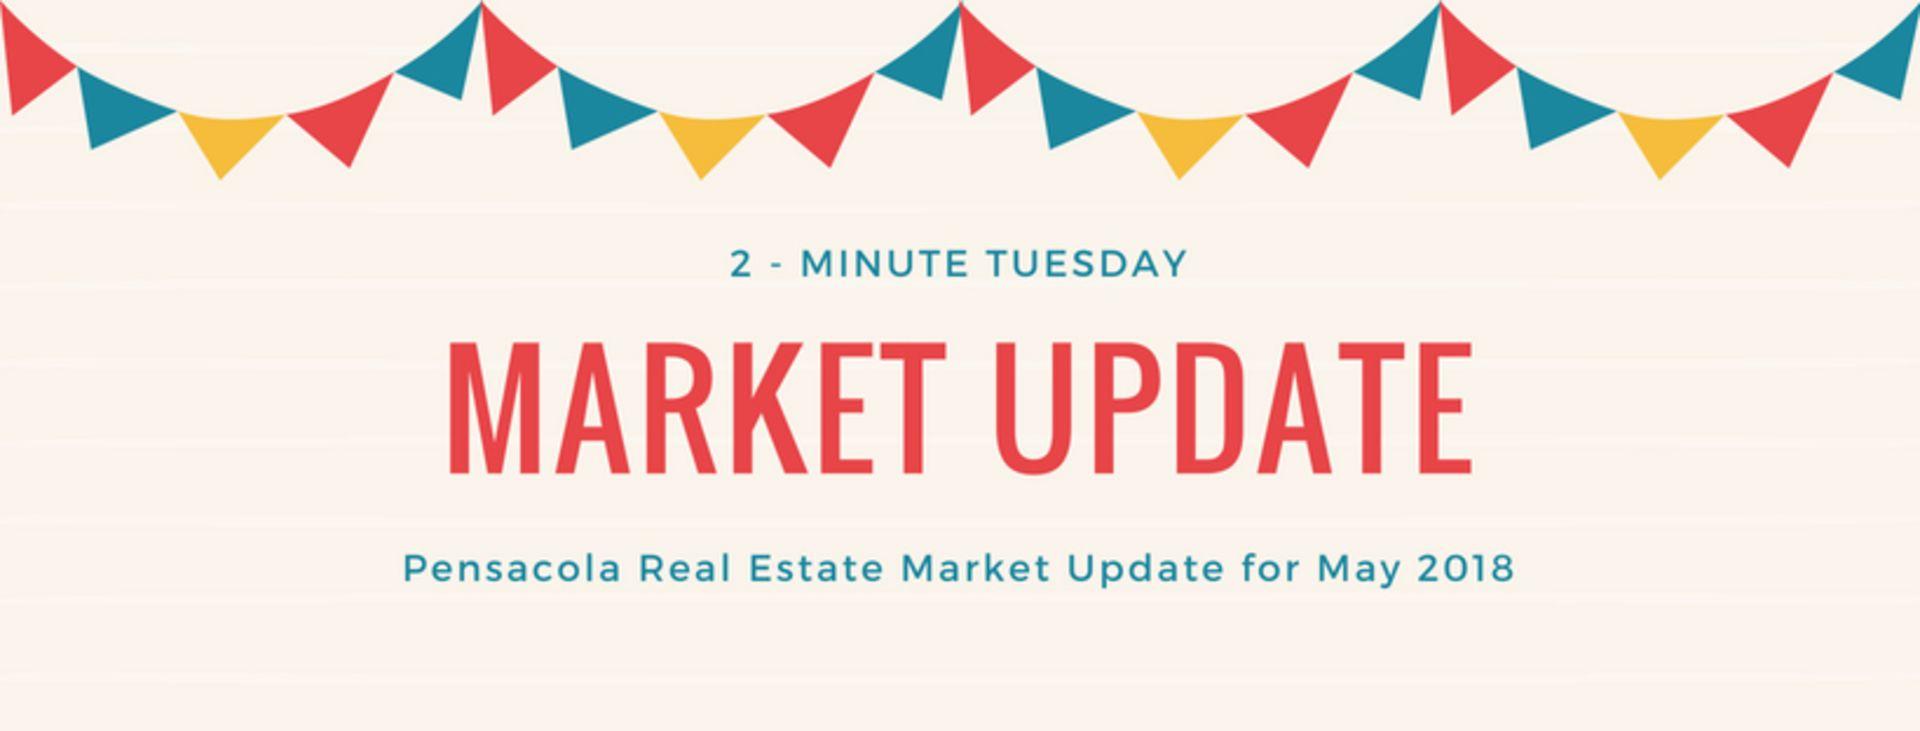 Pensacola Real Estate Market Update